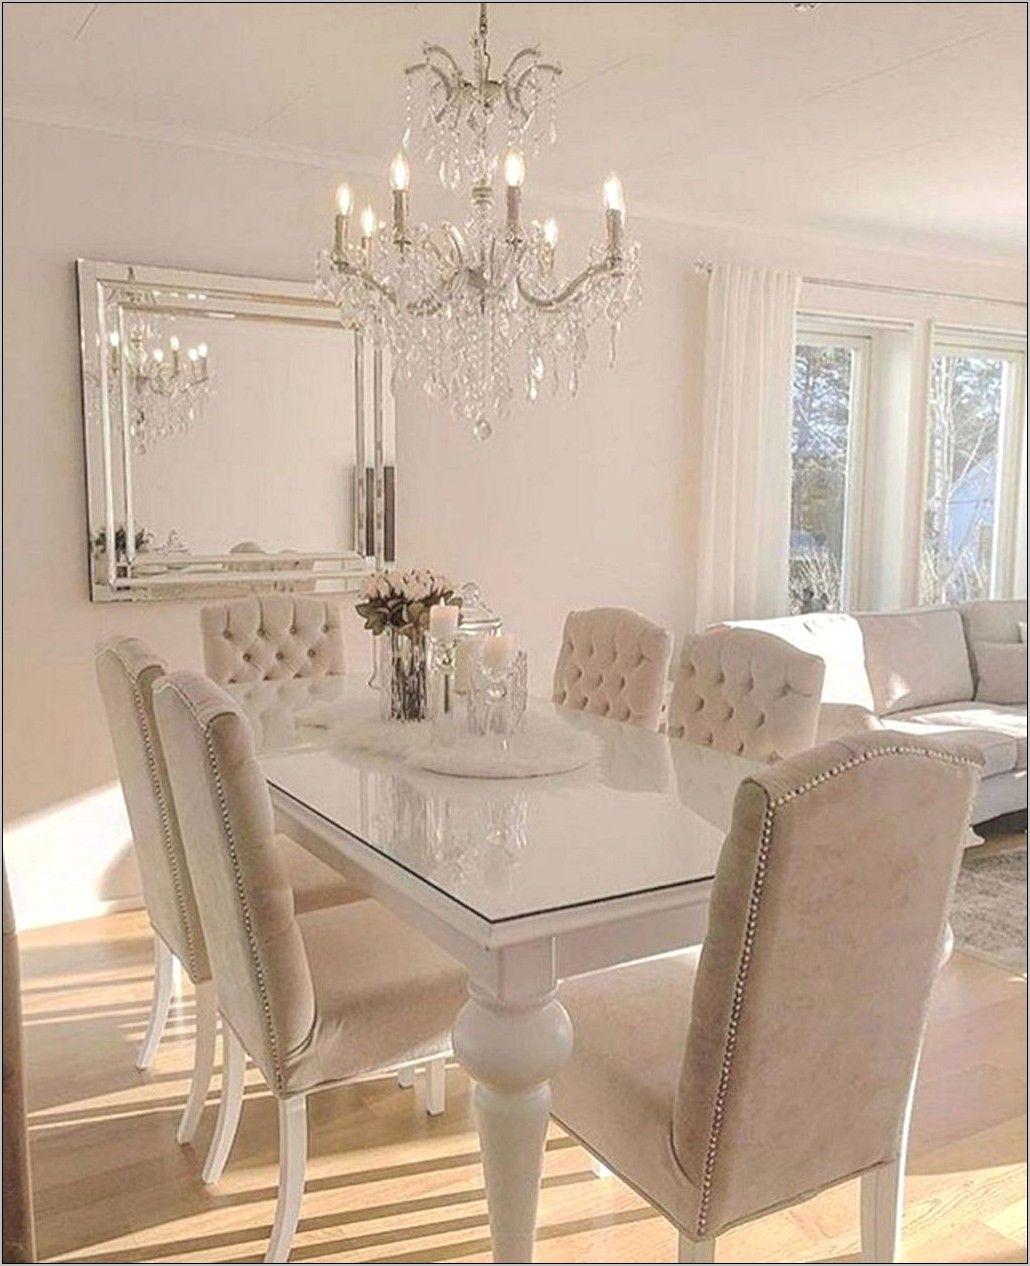 Cozy Dining Room Design Ideas In 2020 Luxury Dining Room Beautiful Dining Rooms Dining Room Table Decor